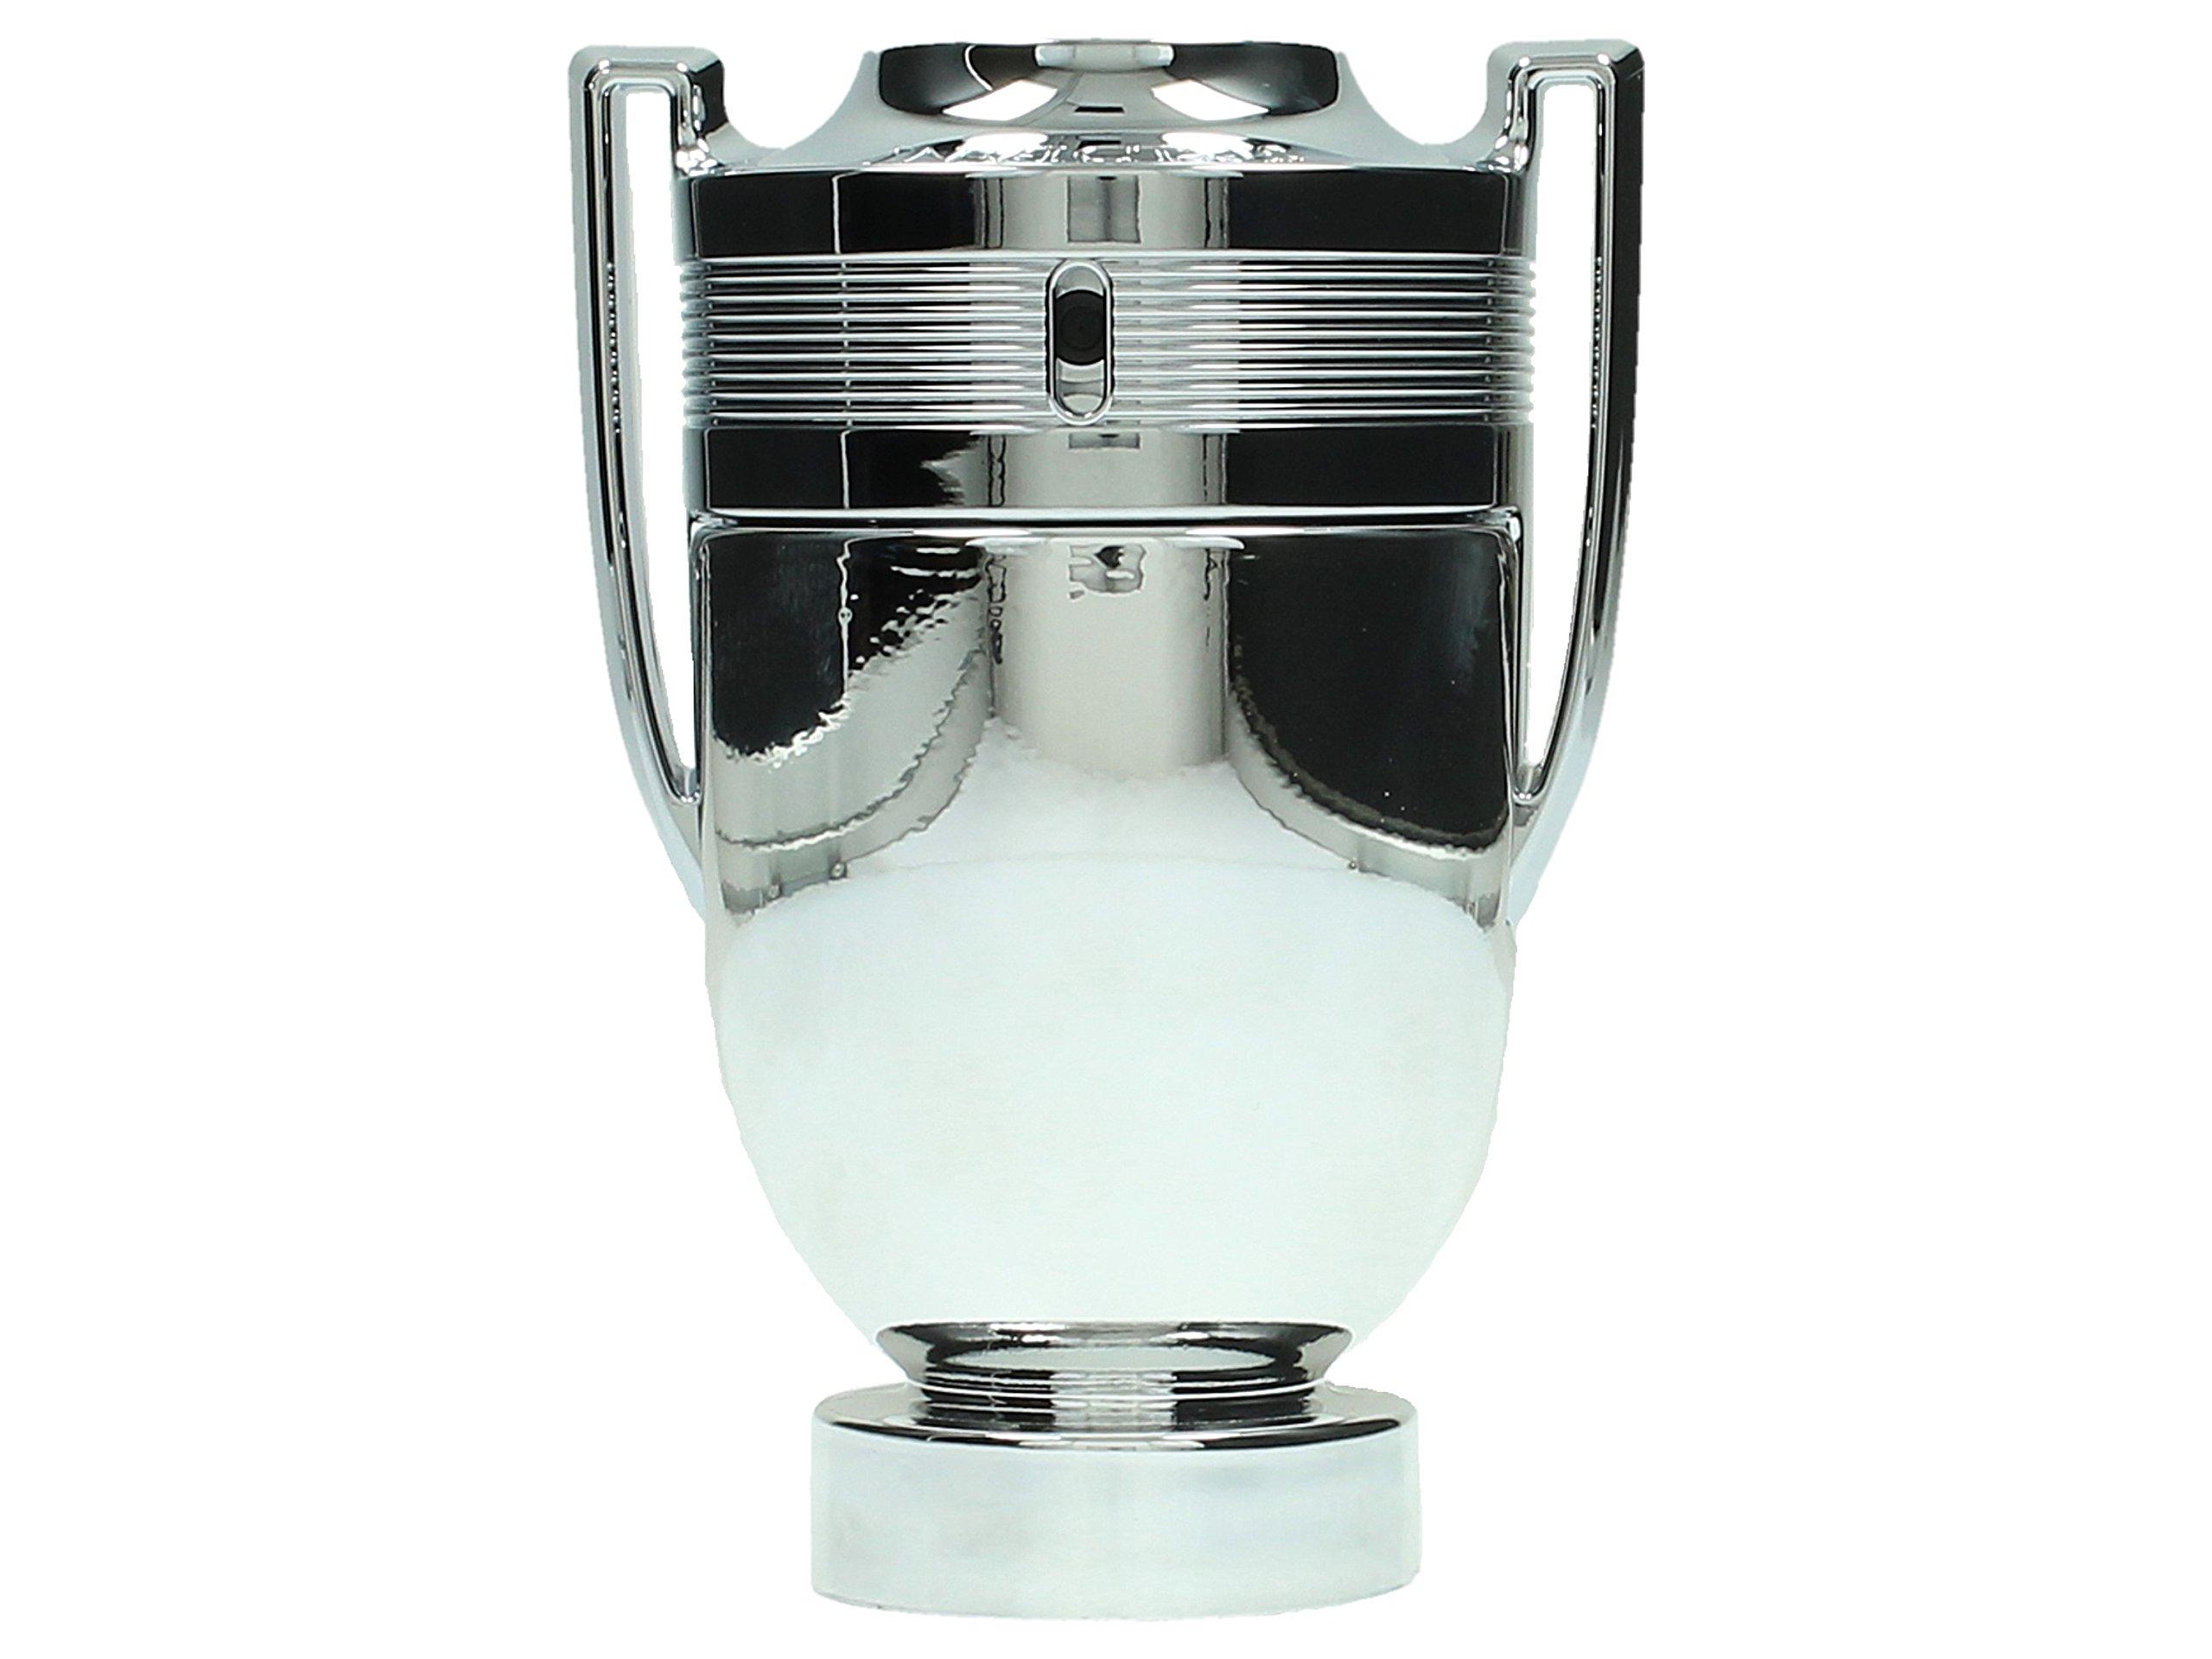 Paco Rabanne EDT Spray 100ml Invictus Collectors Edition